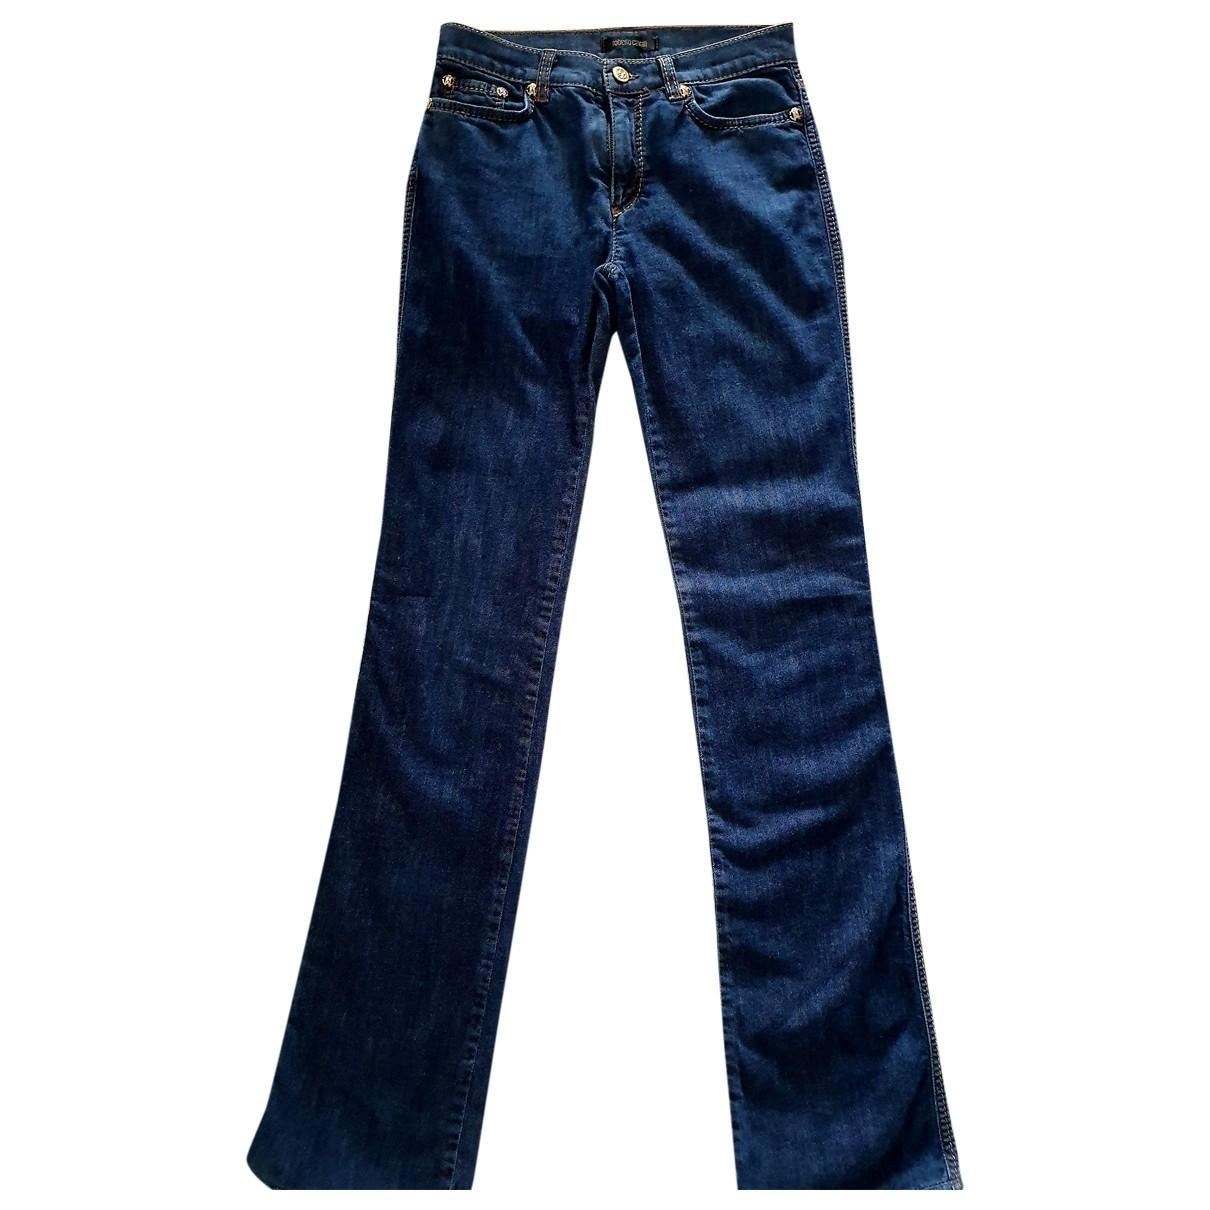 Roberto Cavalli \N Blue Cotton - elasthane Jeans for Women 38 FR